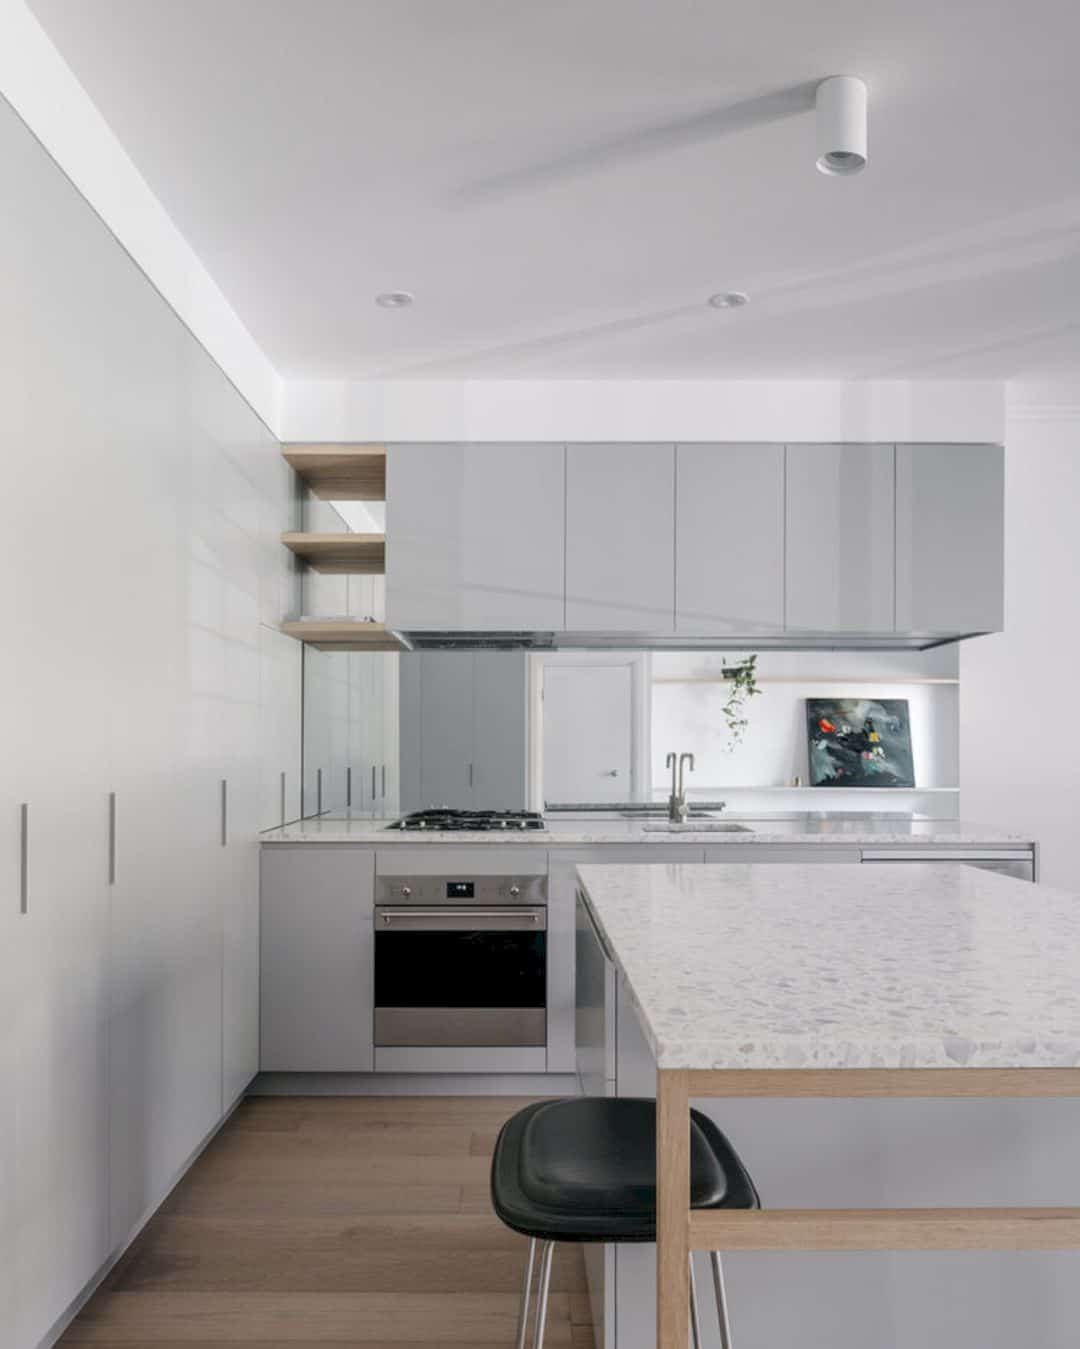 Carlton Apartment By Tom Eckersley Architects 2